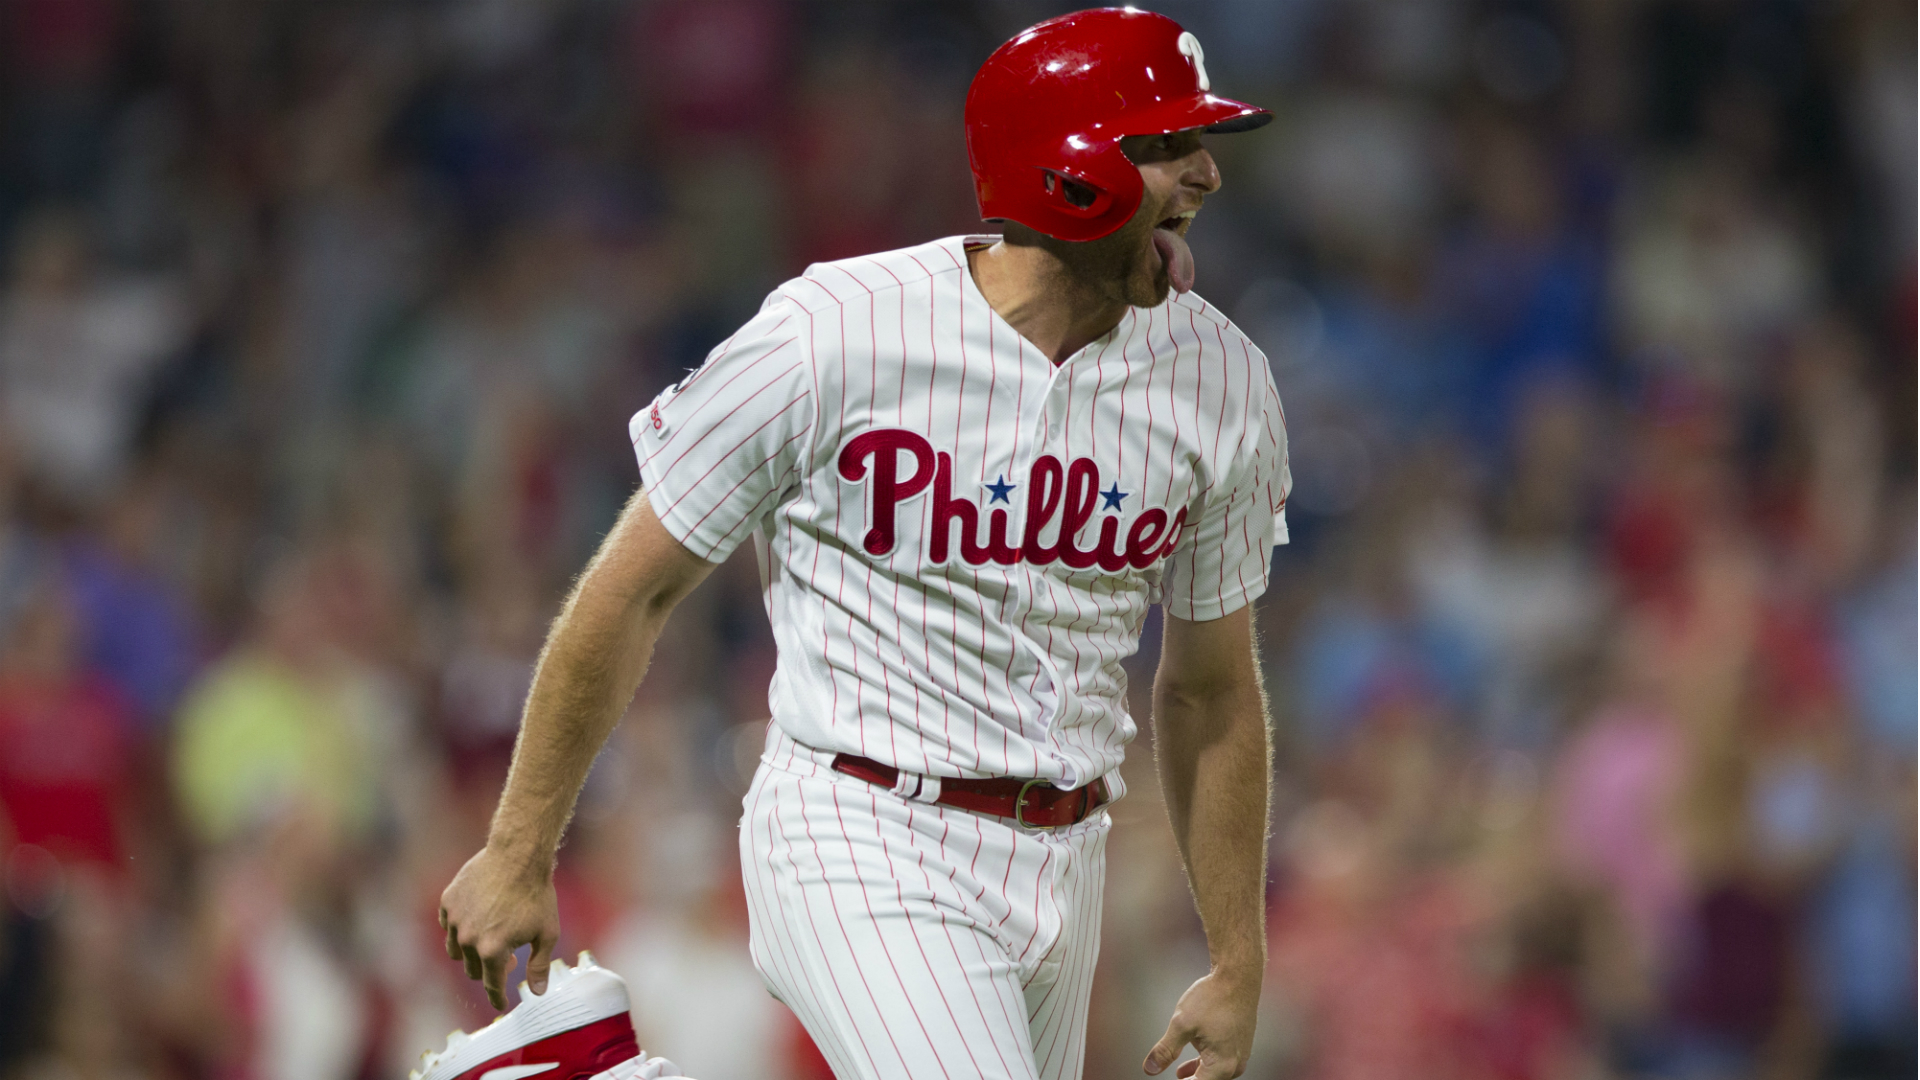 Phillies go all-in on Brad Miller's bamboo magic, giving journeyman's career new gusto